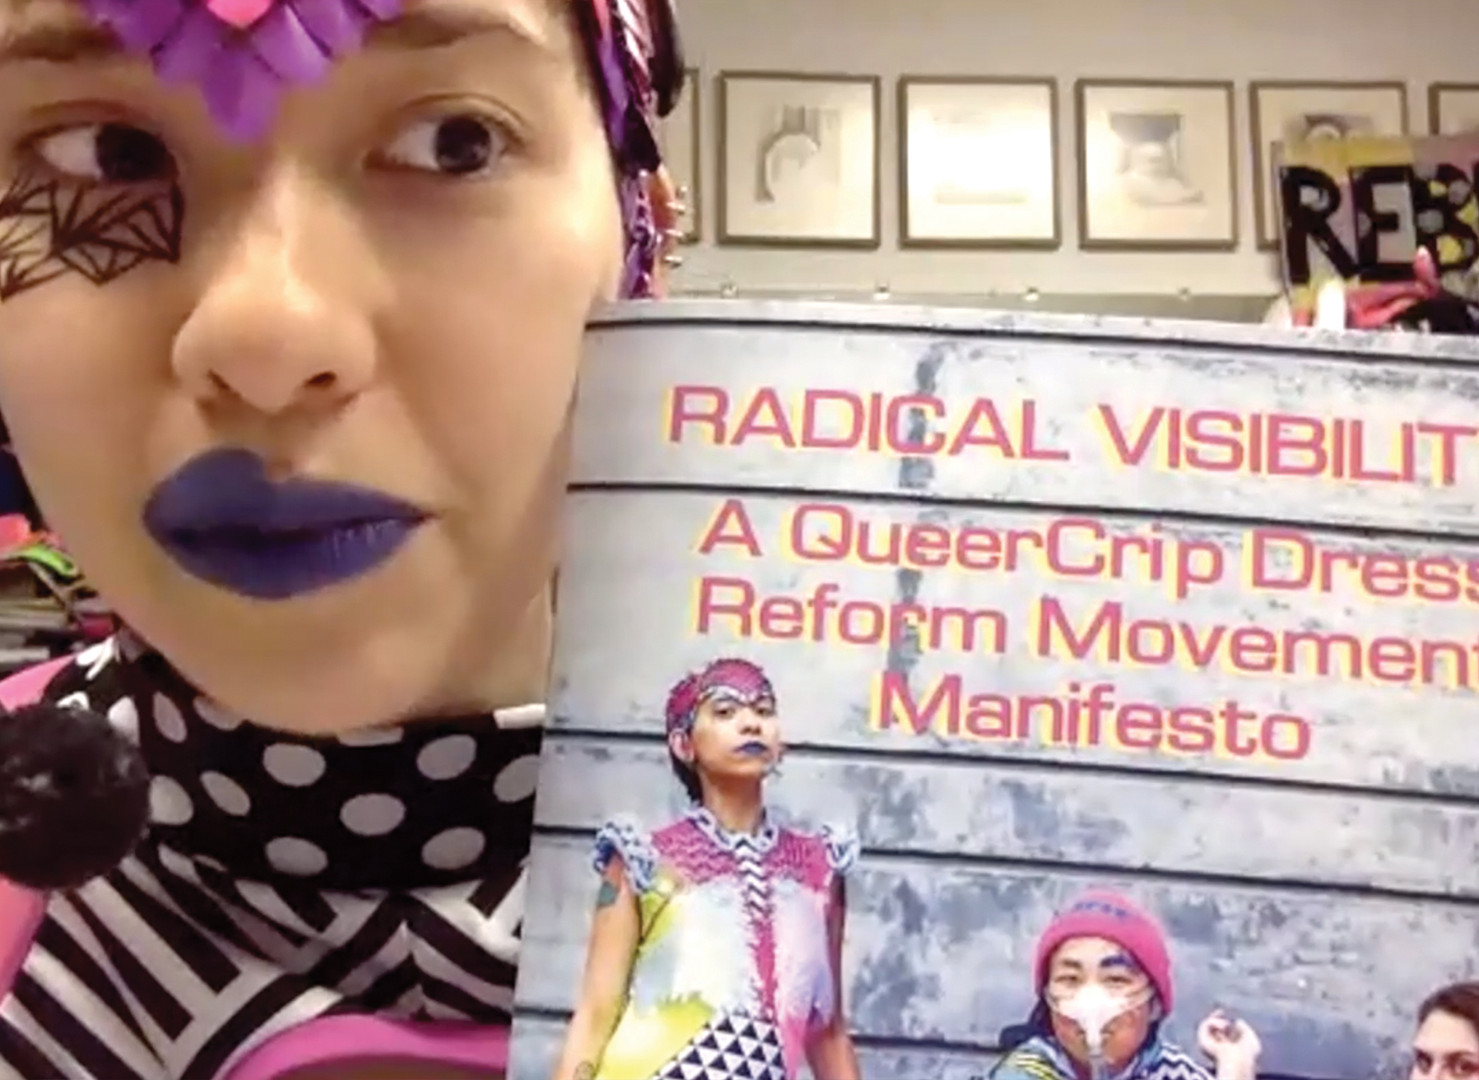 SKY CUBACUB: Radical Visibility